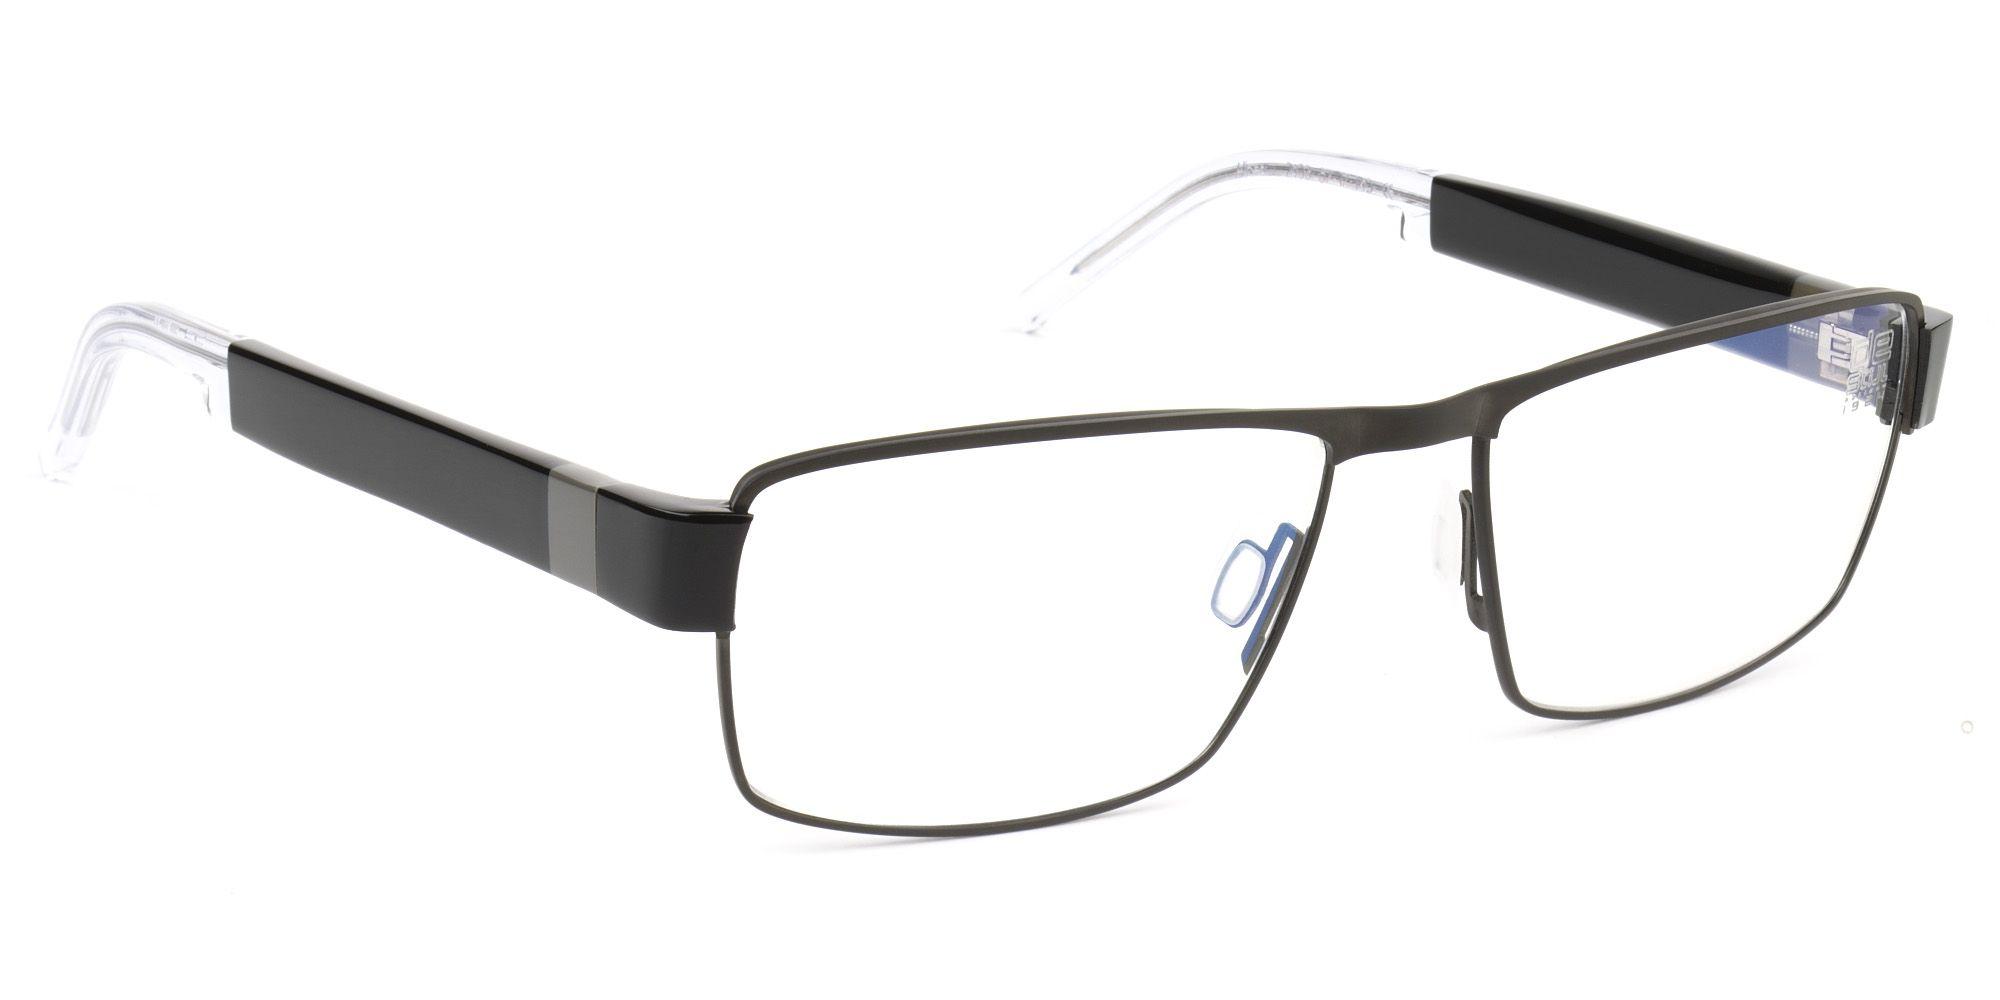 ca9a0003ce80 De Stijl Holland 1924 eyewear  men eyeglasses frame ALBERT in color 2403  gray  black